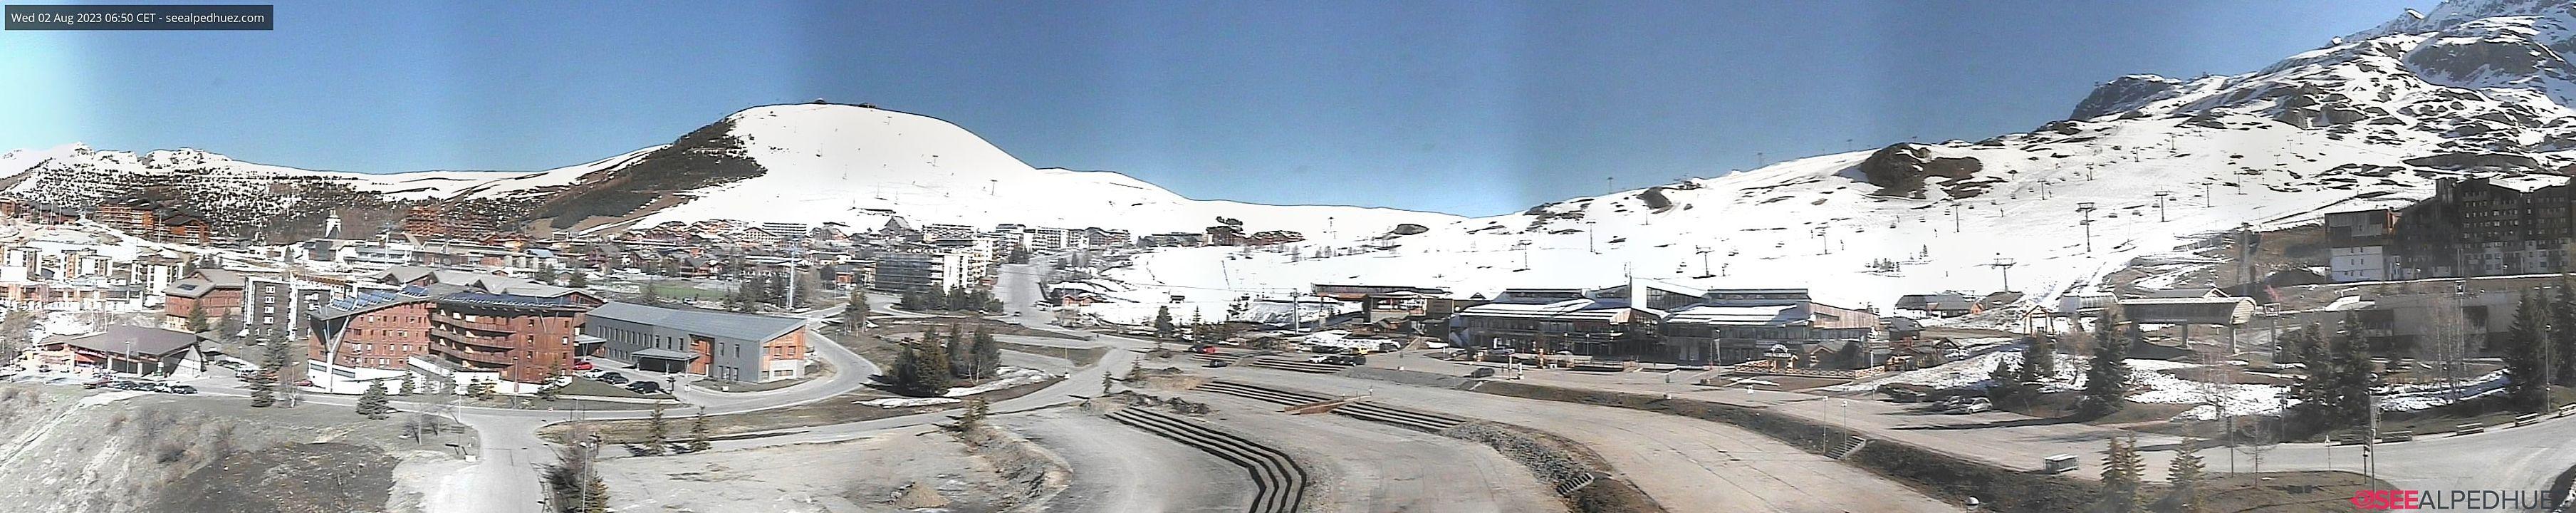 Webcams Alpe d'Huez